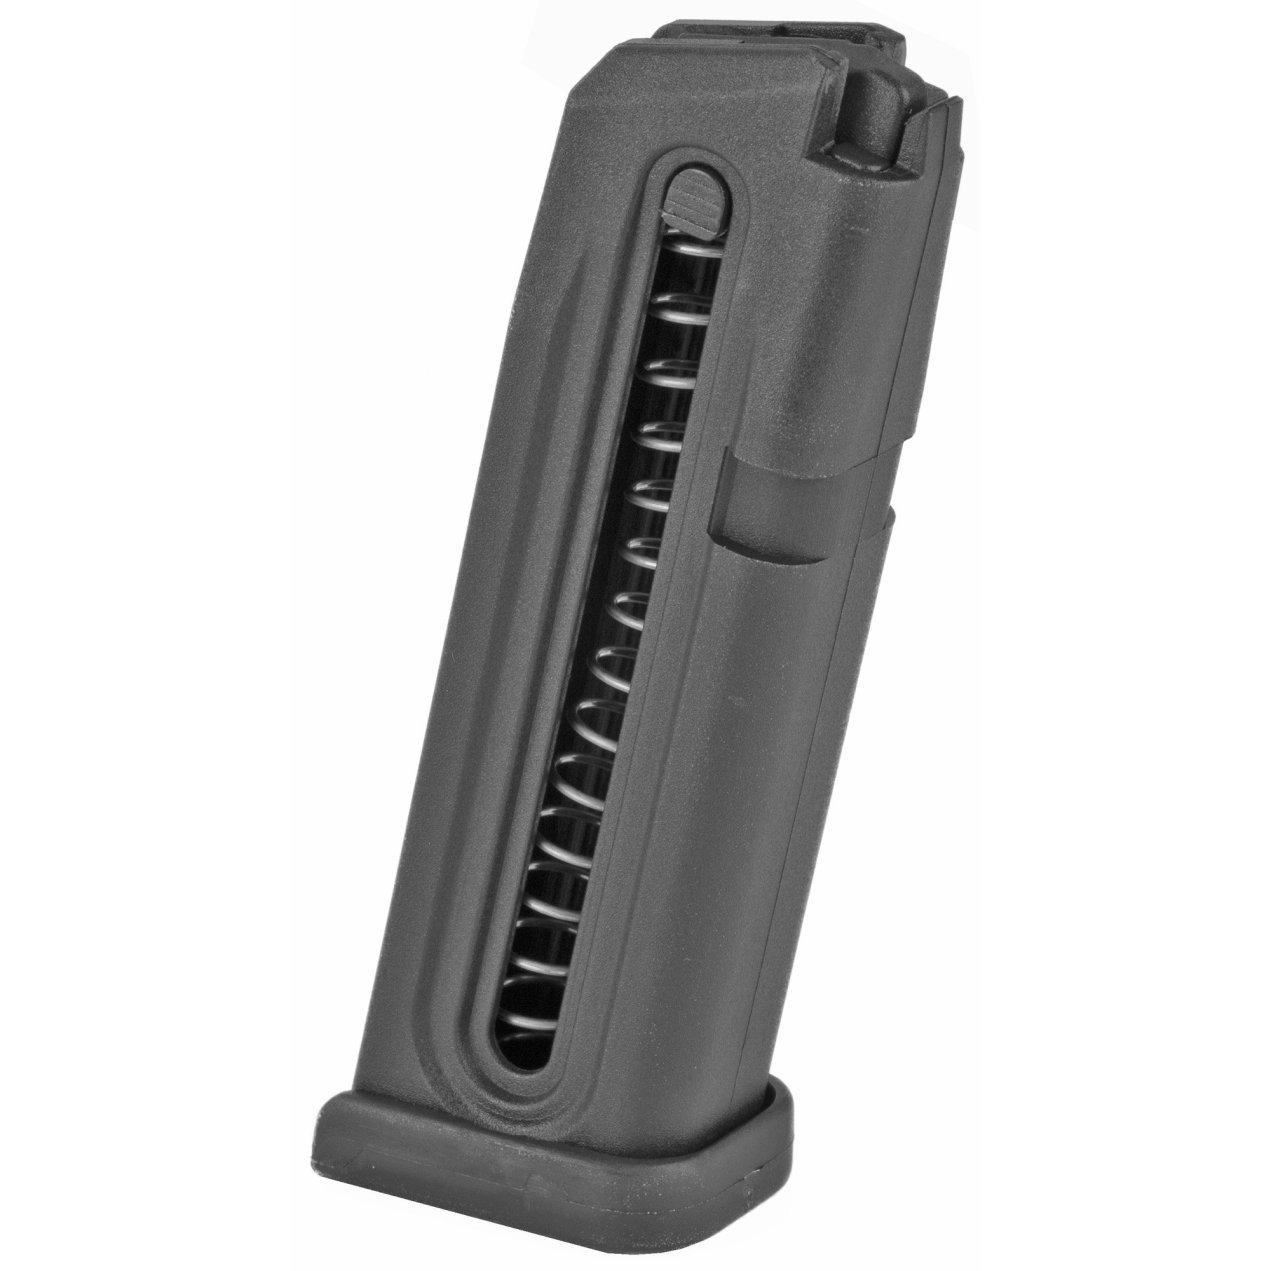 Promag 18 Round Mag For Glock 44 22LR